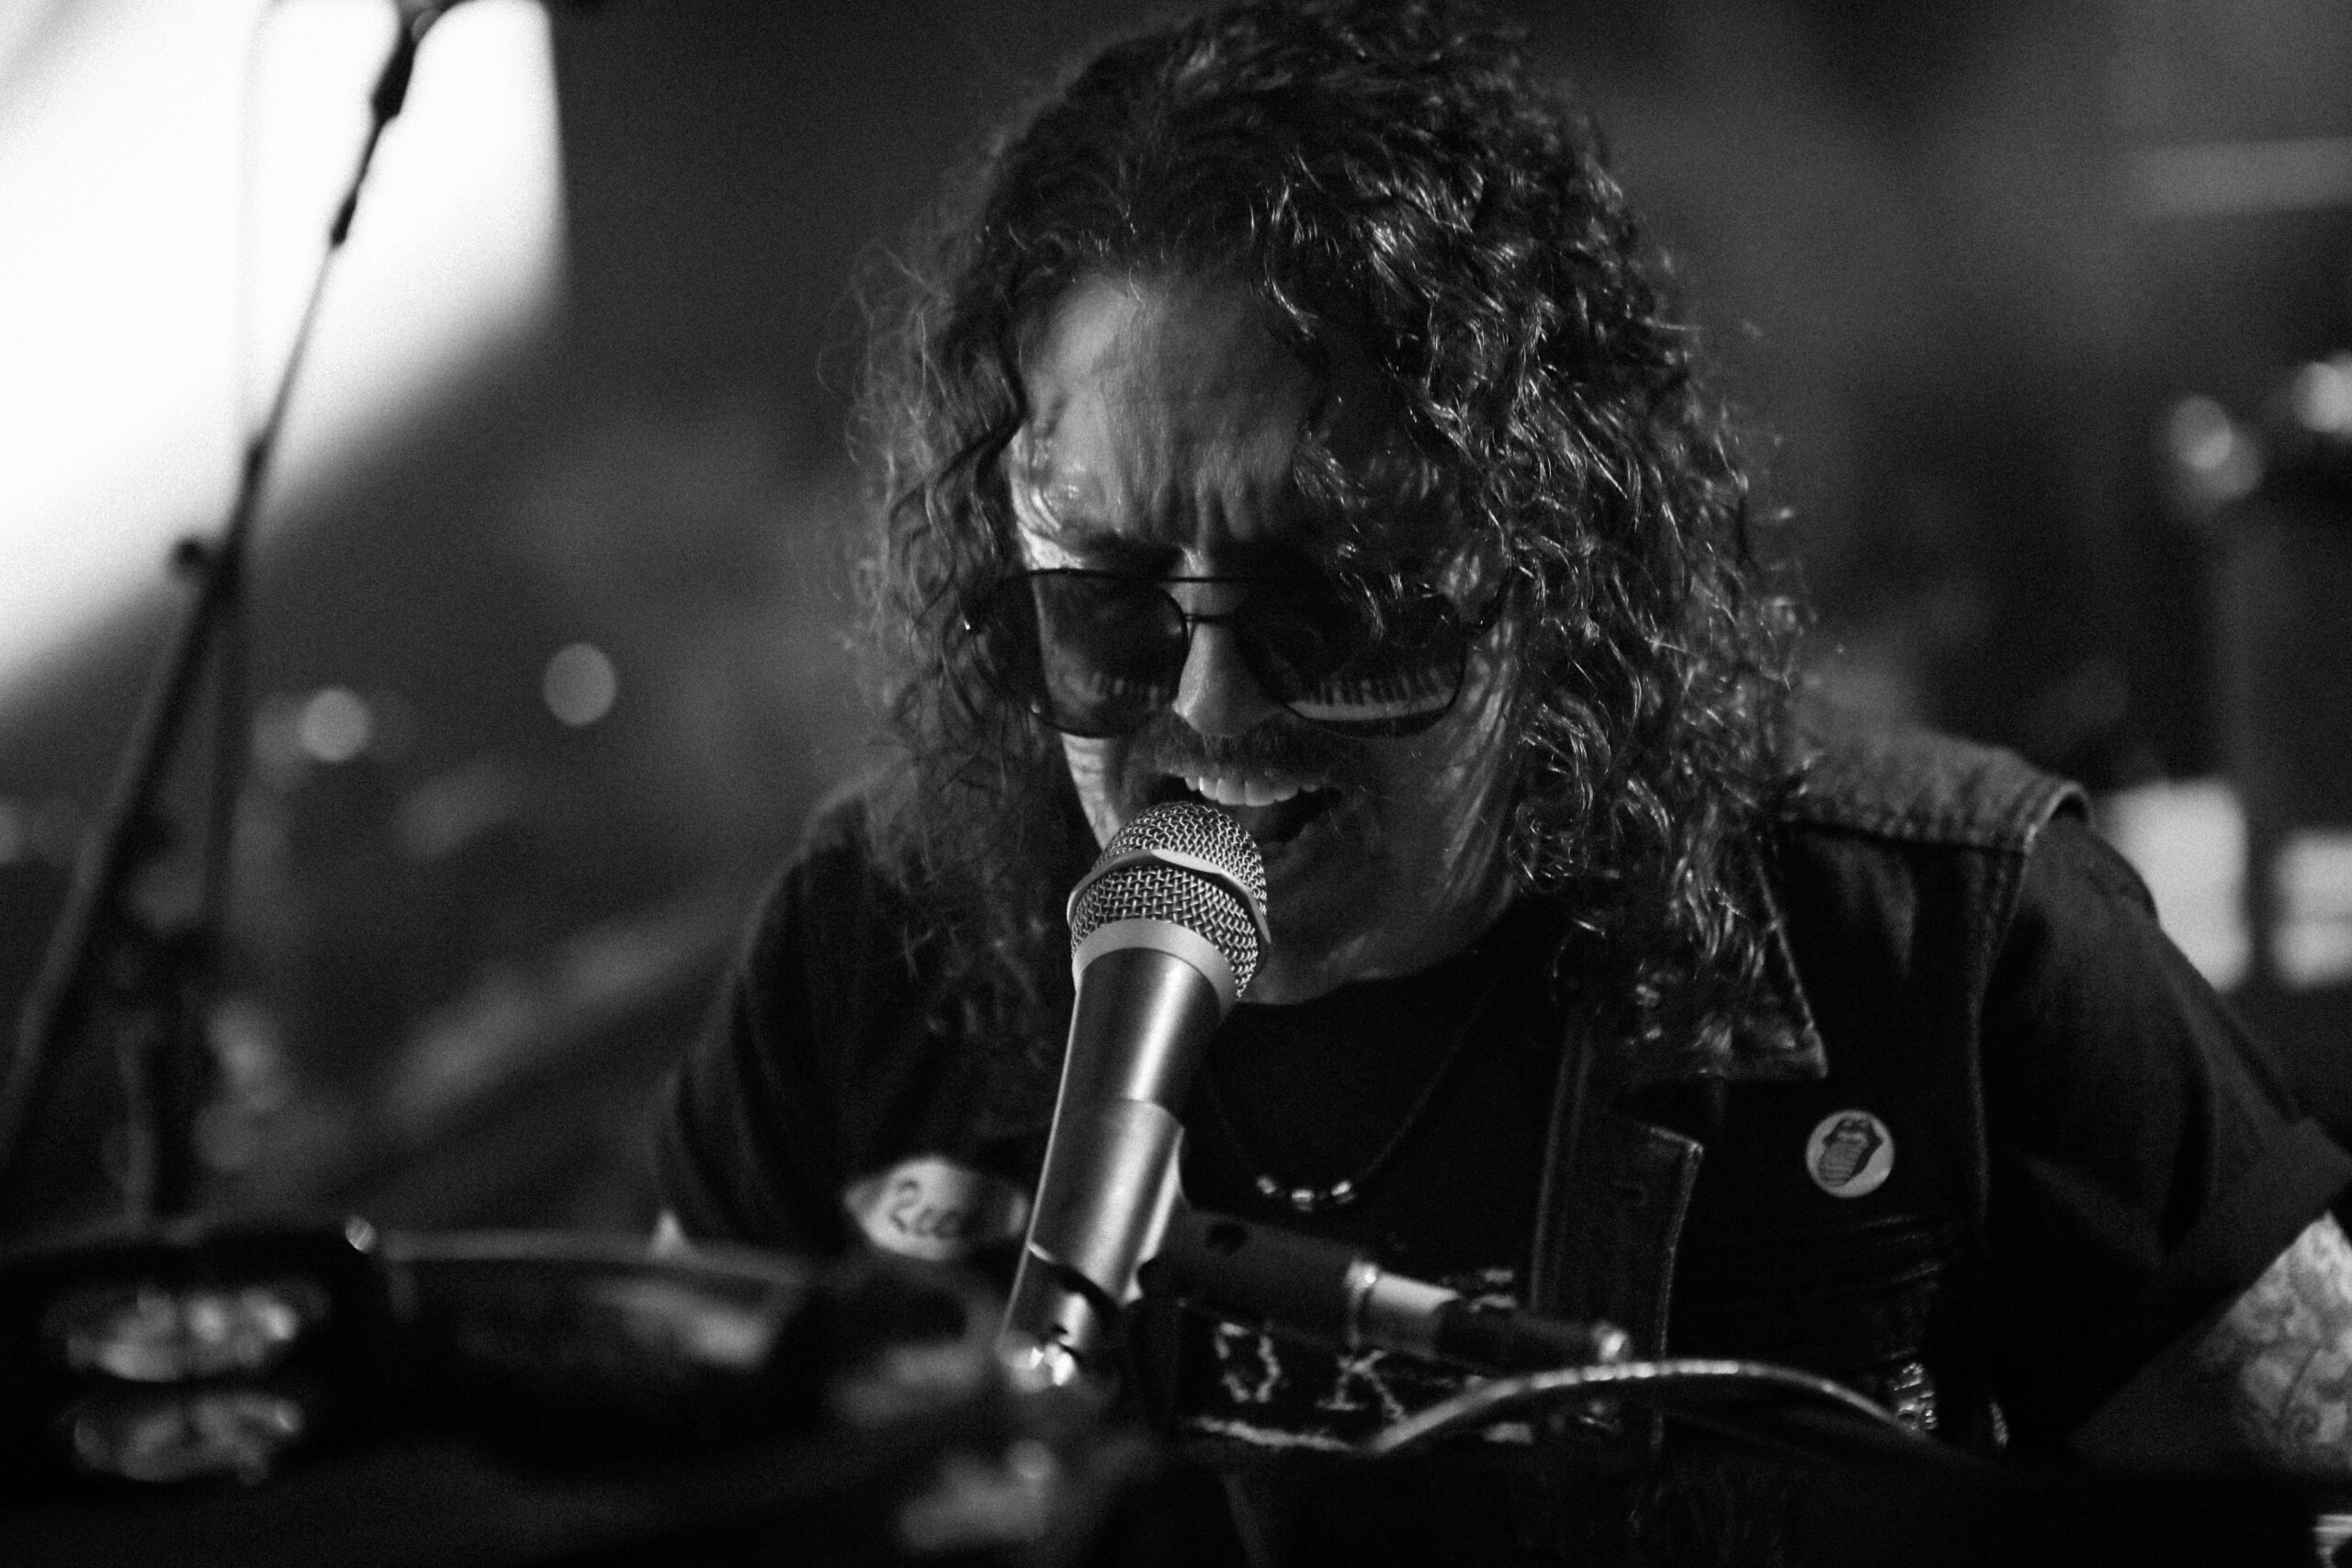 2021.09.11 - Hard Rock Live at Etess Arena, Atlantic City, NJ, USA E_r45n10